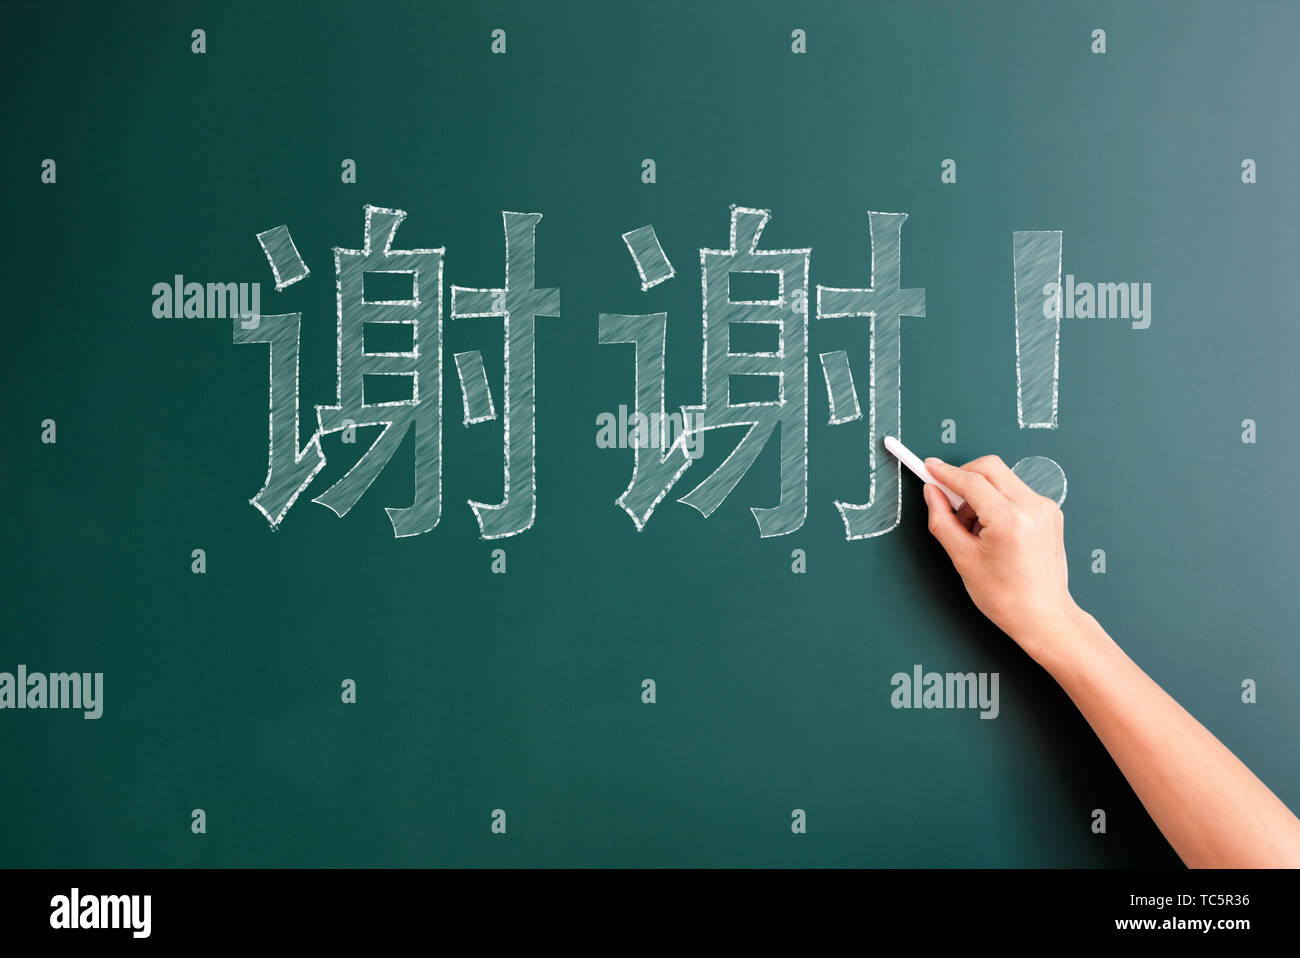 chinese word 'thank you' written on blackboard - Stock Image